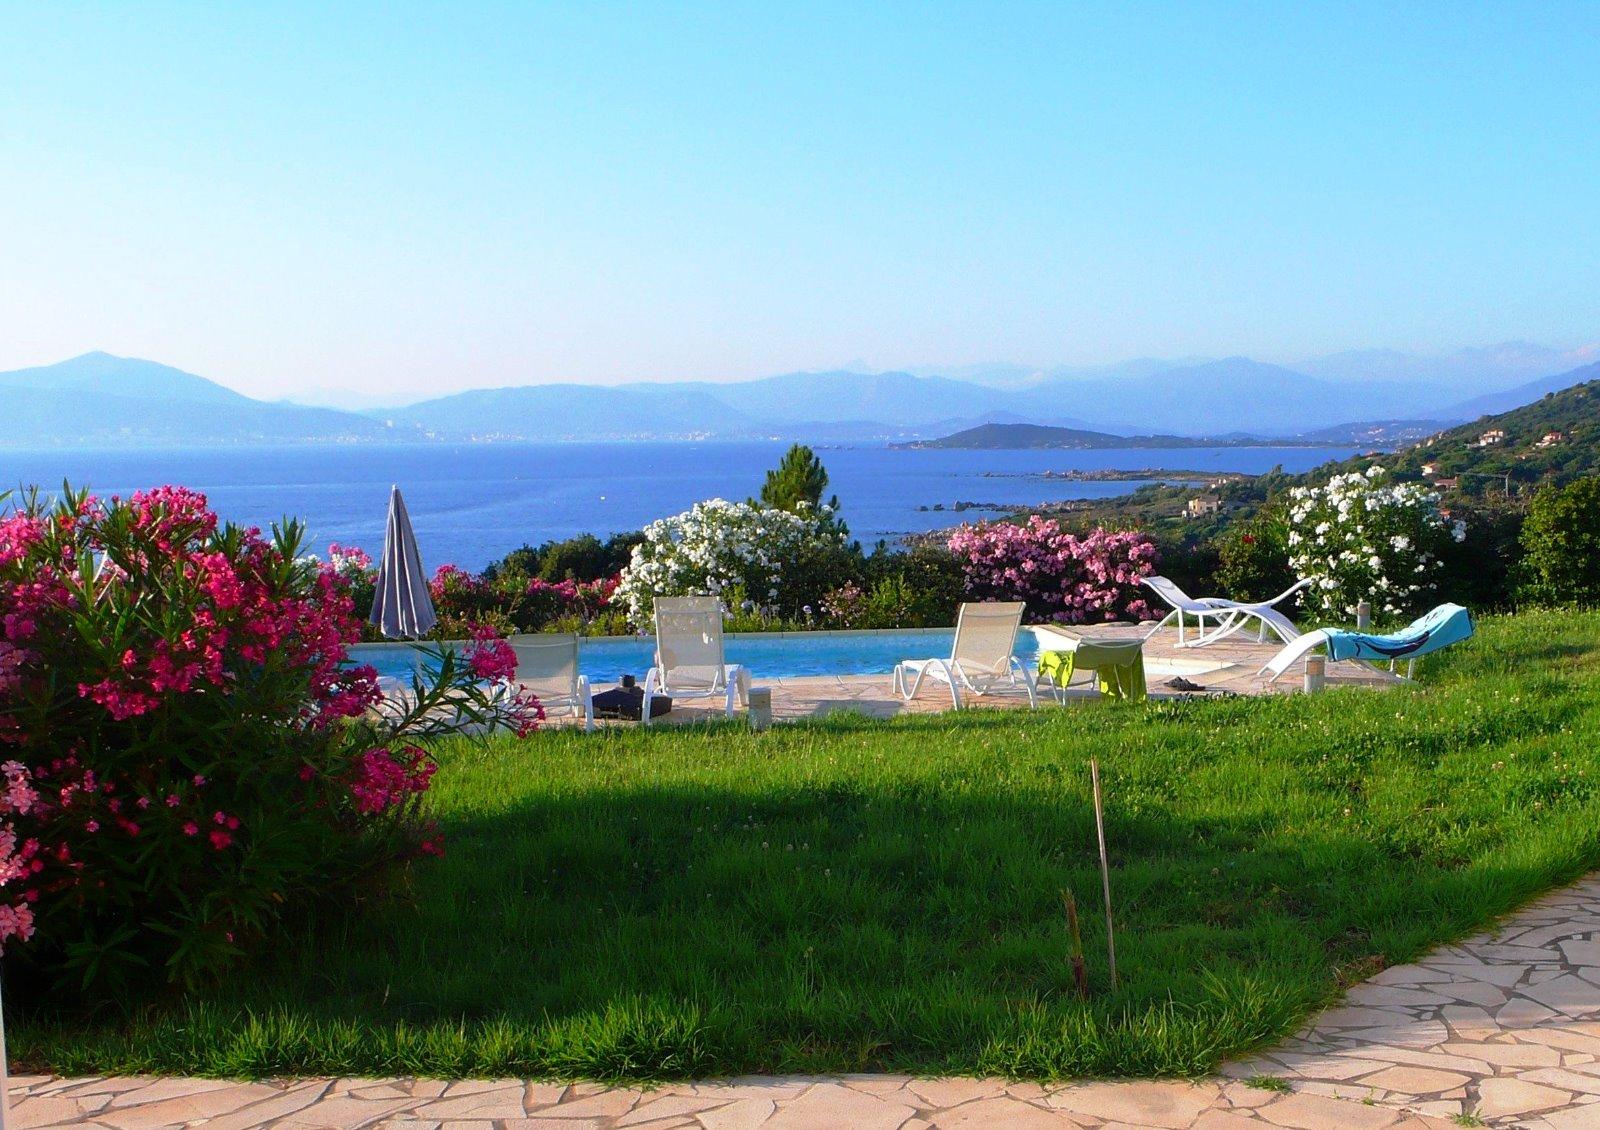 Corse du sud villa 200m dominant la magnifique plage de portigliolo pierre et patrimoine corse - Villa corse du sud ...